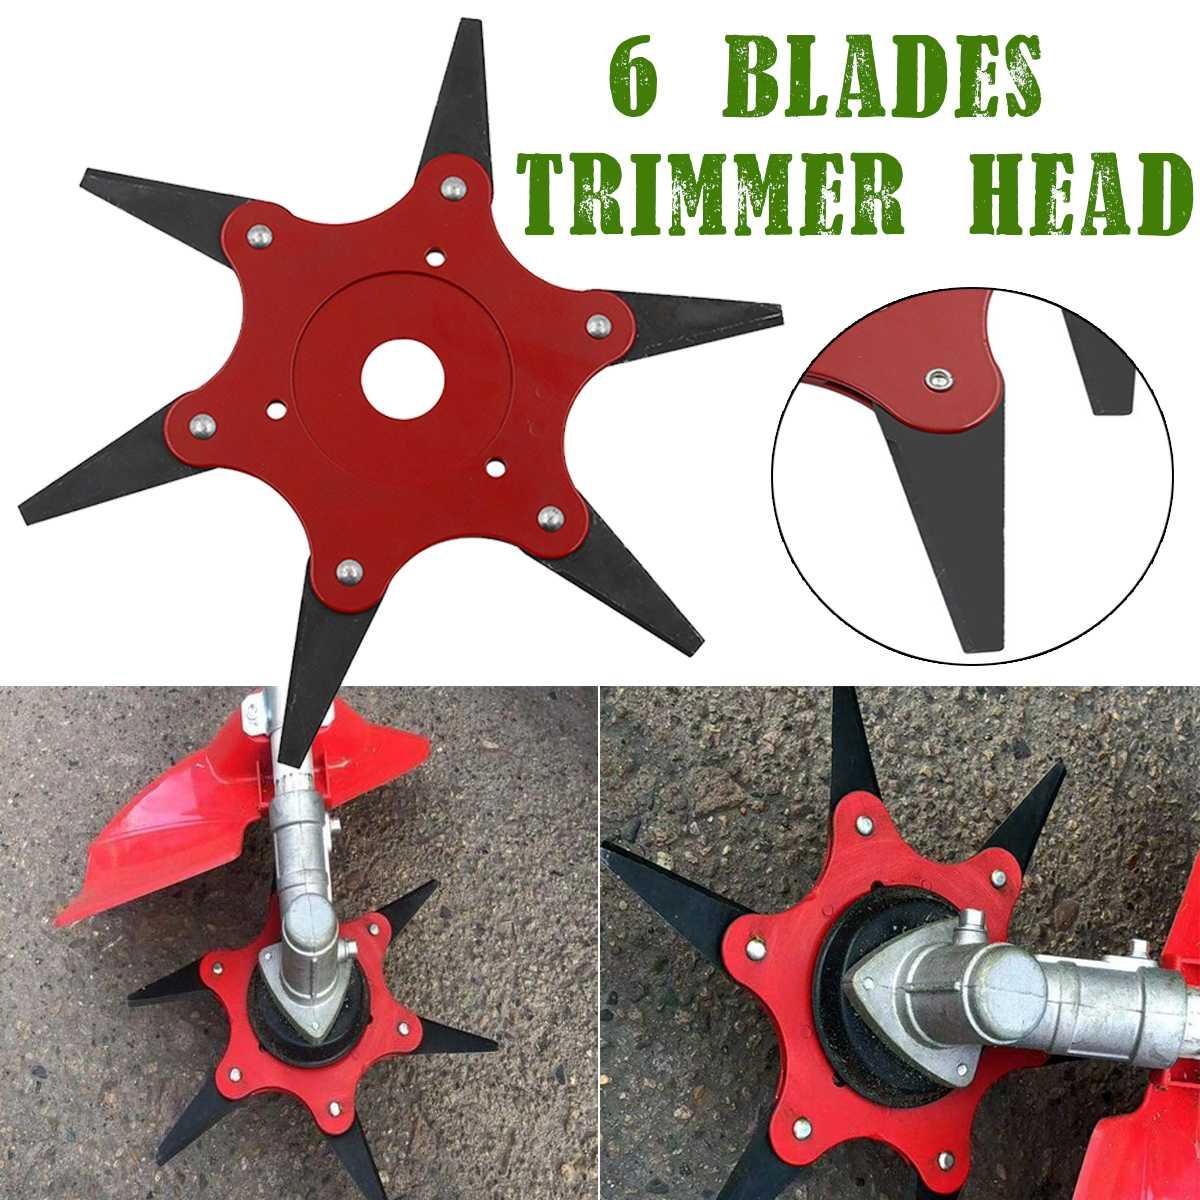 70mm Upgrade 6 Teeth Blade Trimmer Head 65Mn Steel Outdoor Lawn Mower Grass Brush Cutter Trimmer Head Razors Power Tool Parts